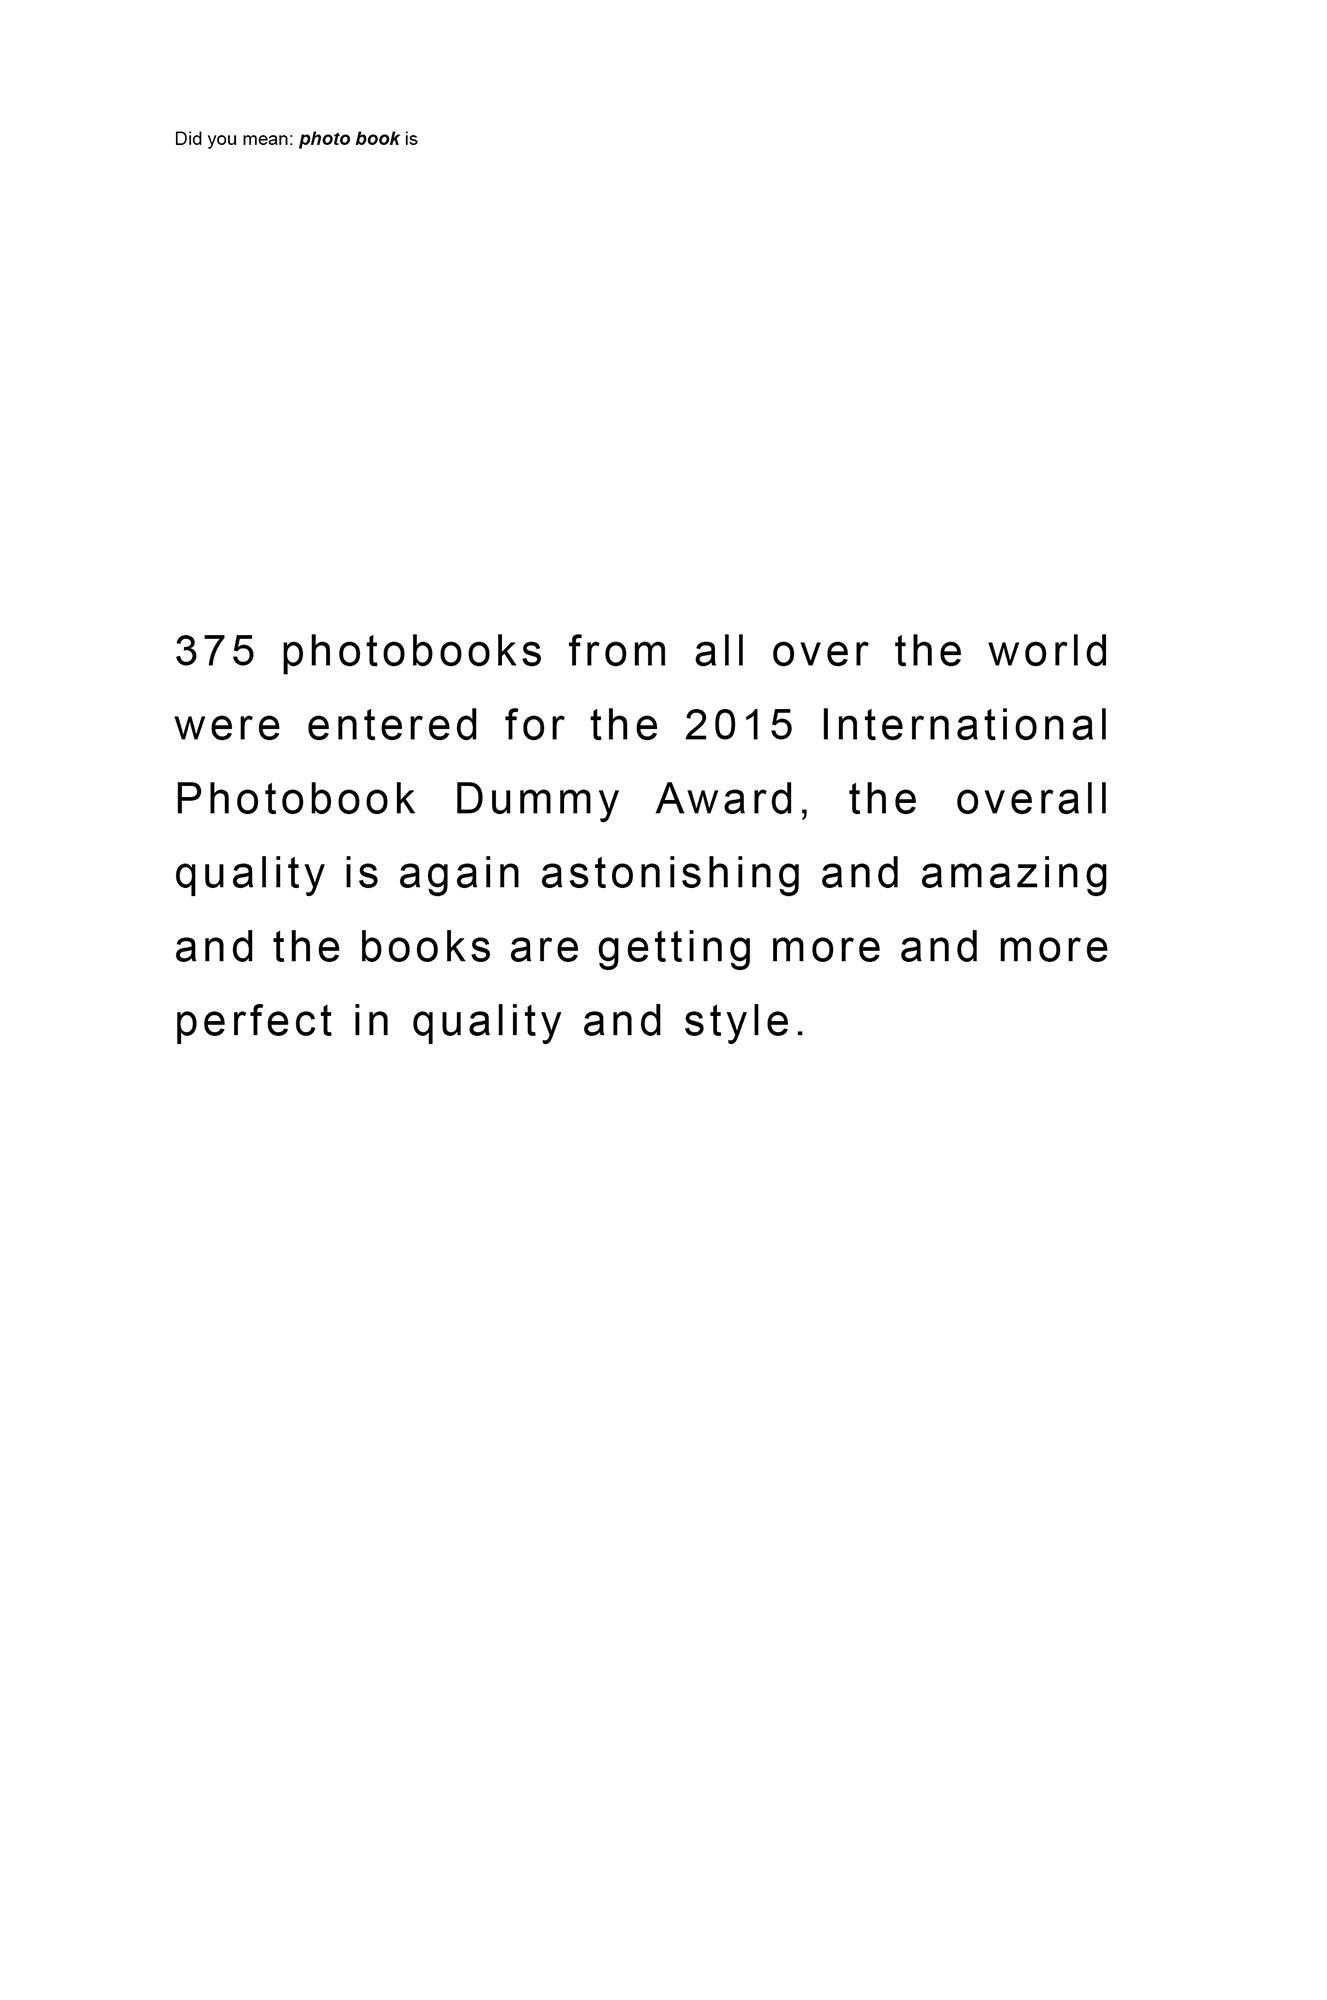 msdm-photobook-is-p23